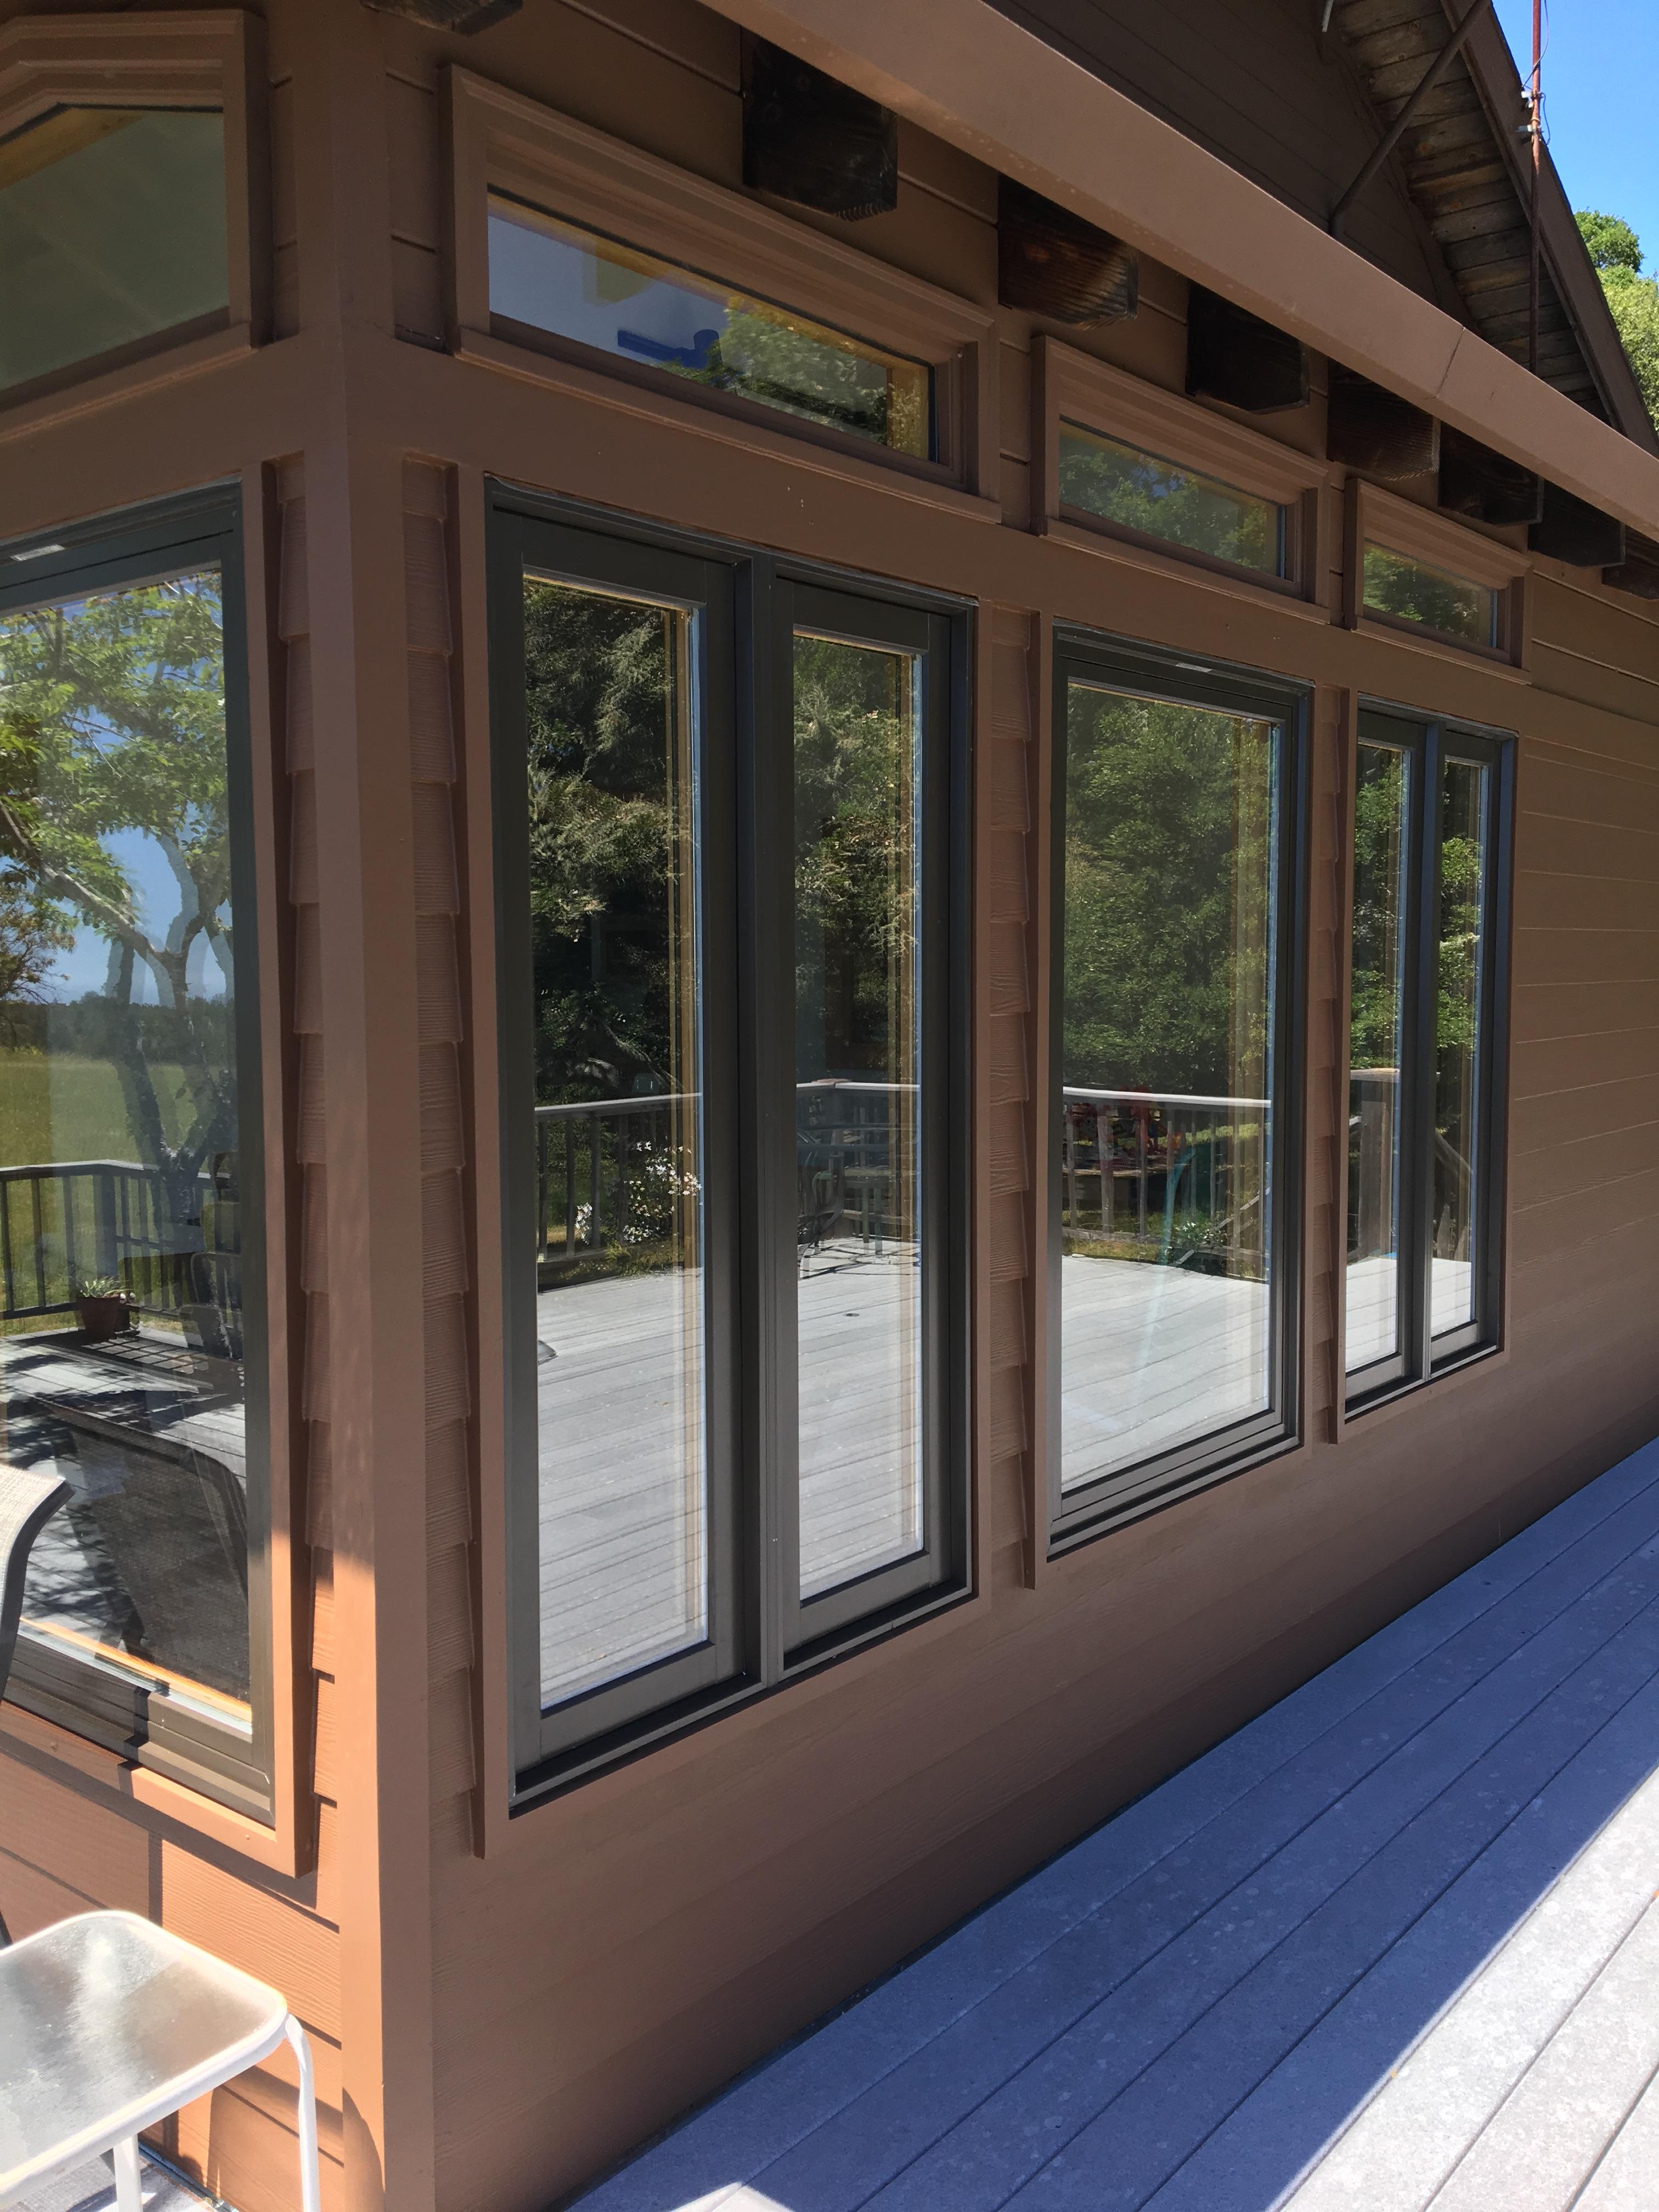 Energy efficient wood windows upgrade a country cabin for Milgard energy efficient windows